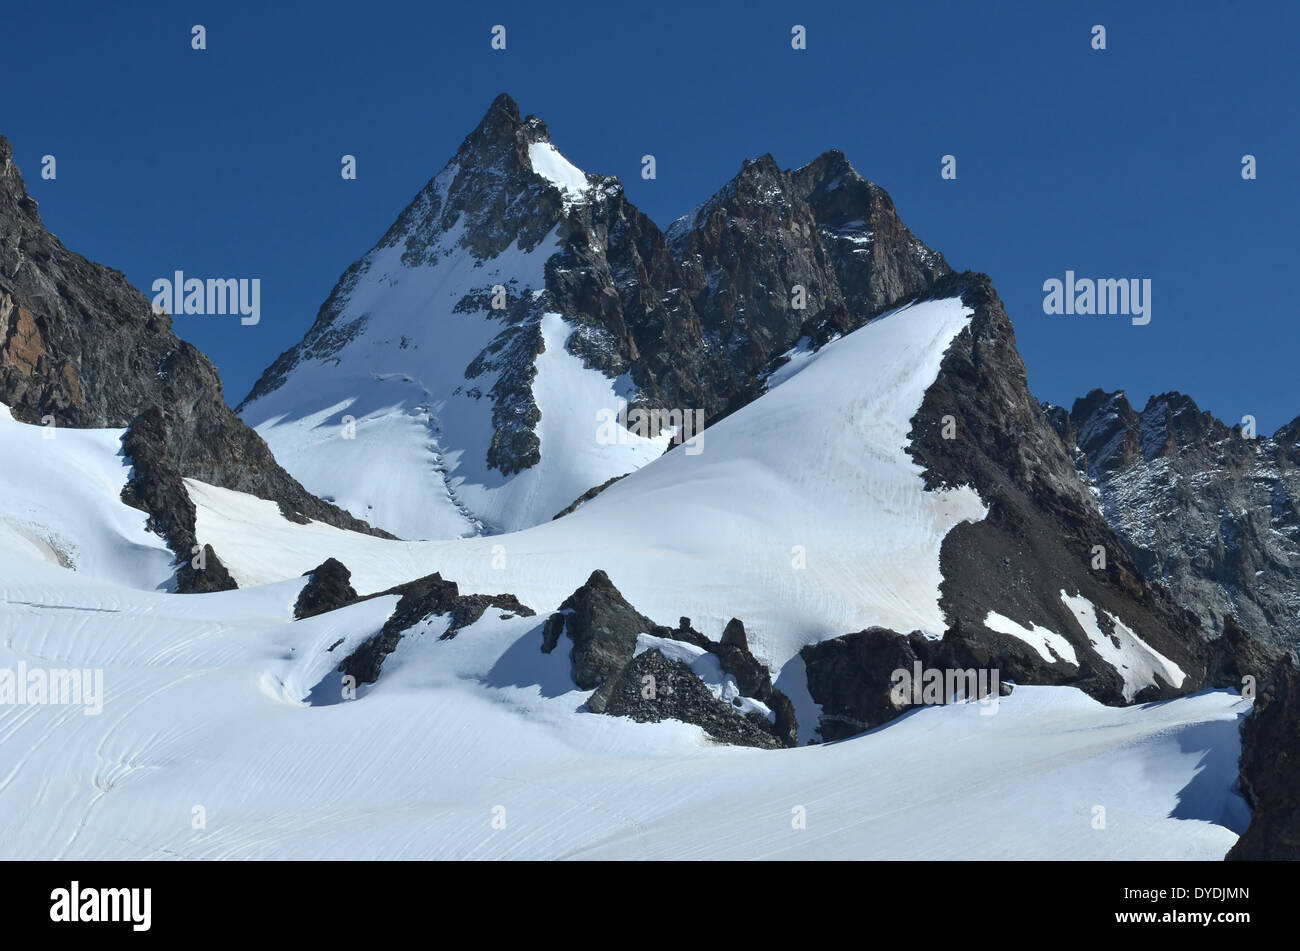 Swiss Switzerland Europe Valais Wallis alps alpine mountains peaks Europe sport nature ice glacier summer Zermatt ferpecle - Stock Image